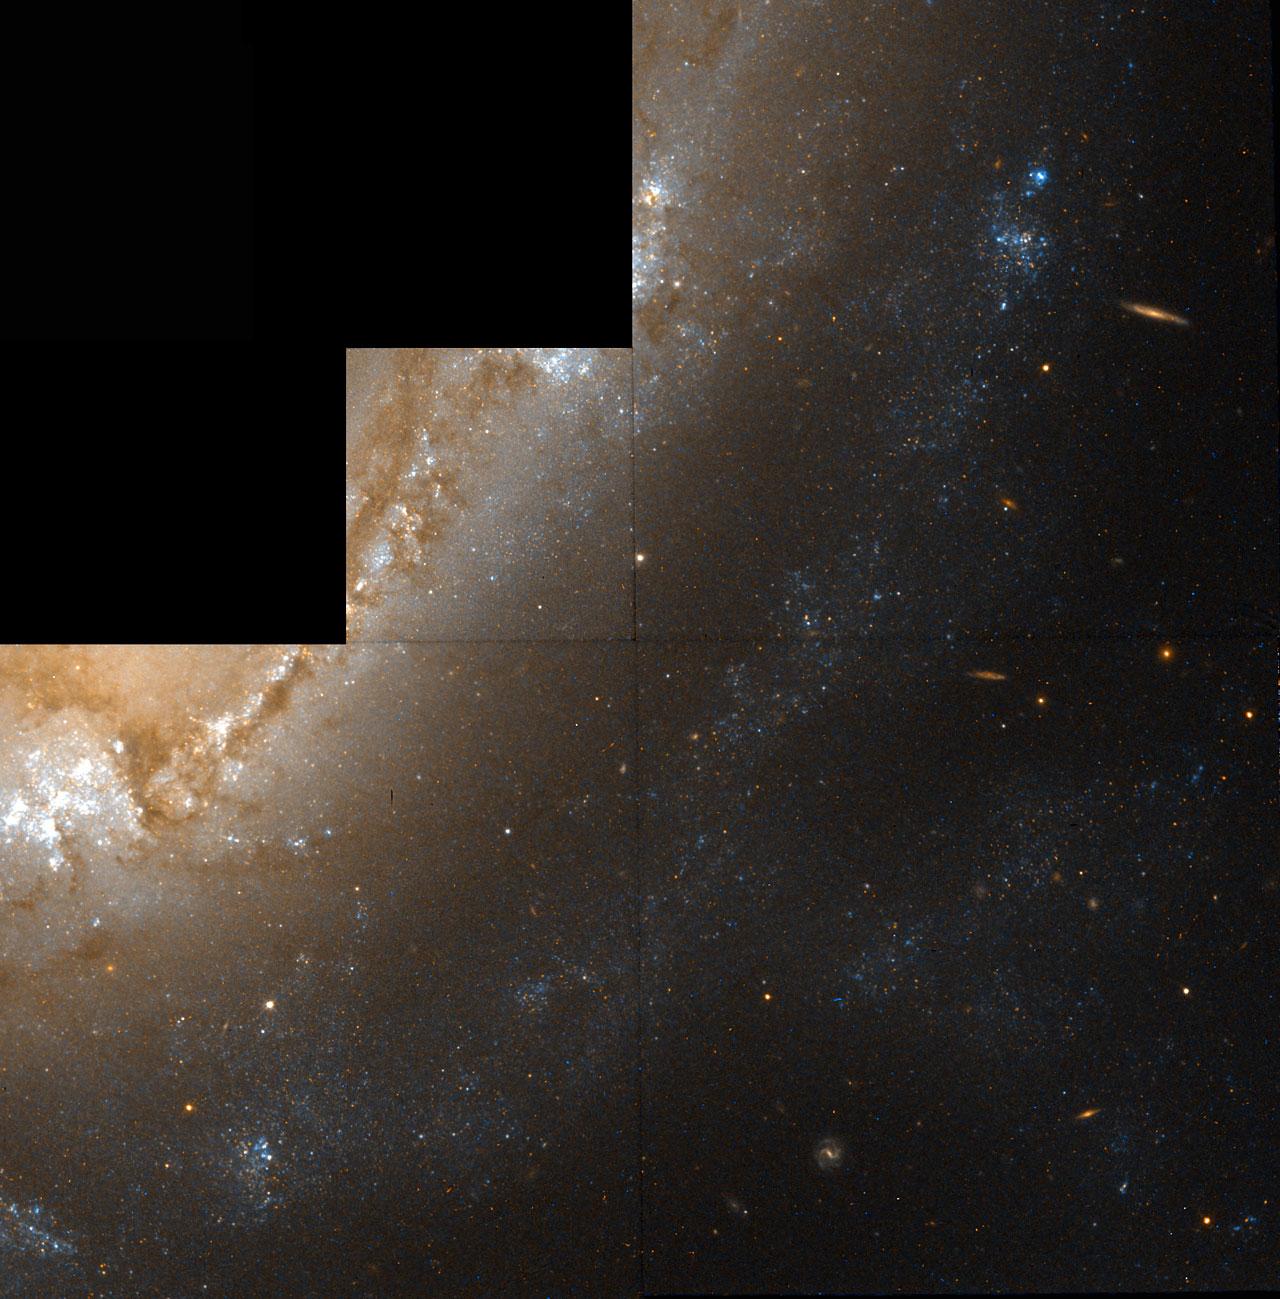 Galaxy NGC 1365